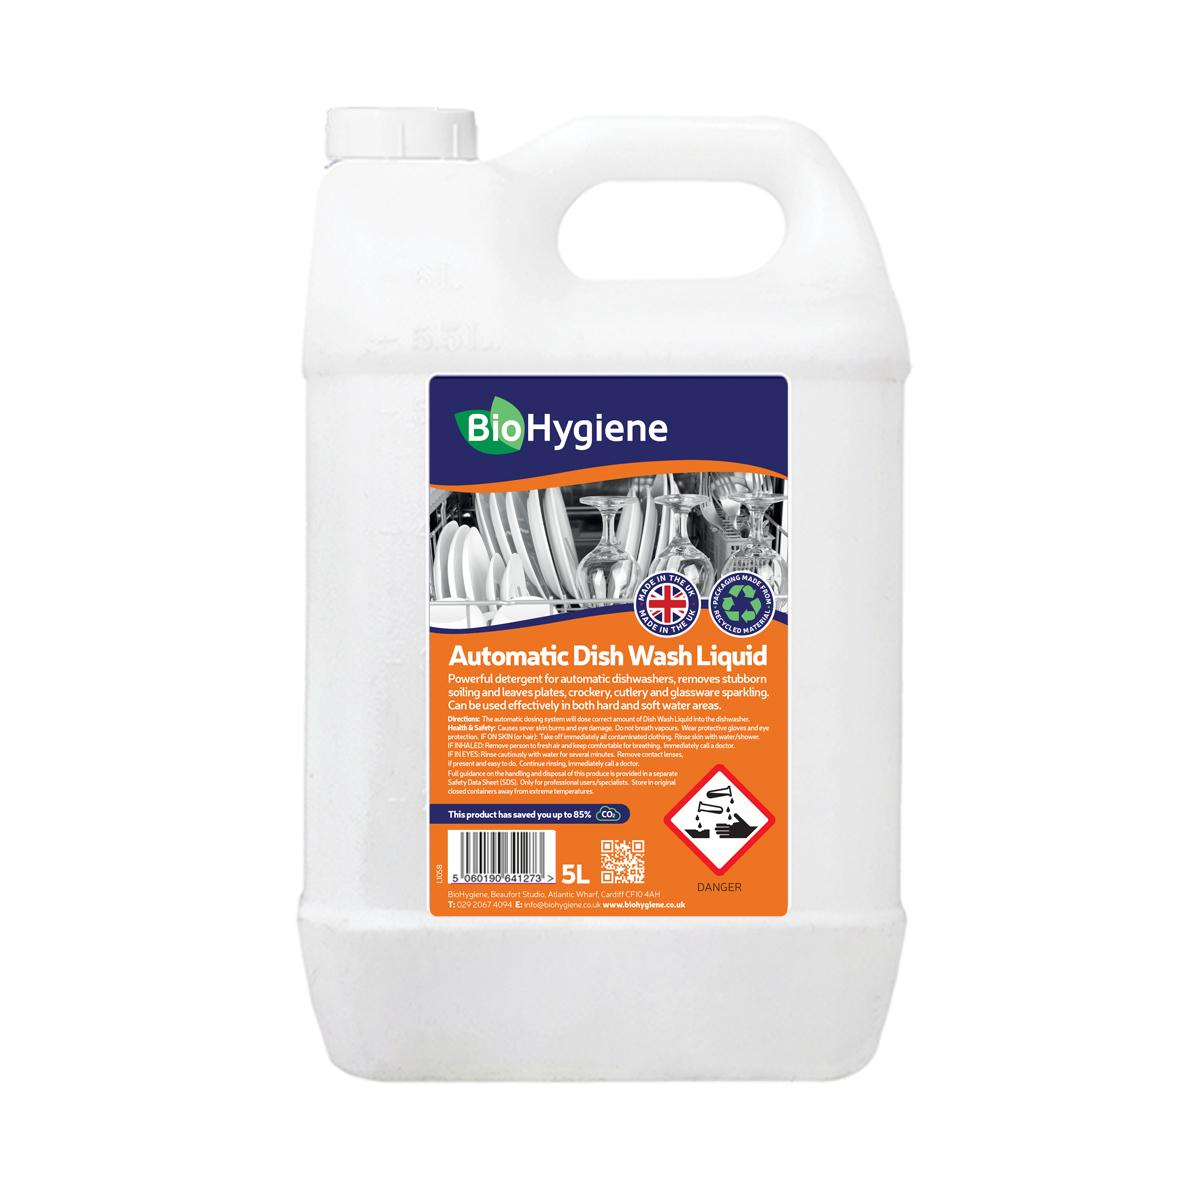 Dishwashing products BioHygiene Automatic Dish Wash Liquid 5Litre Bottle Ref BH172